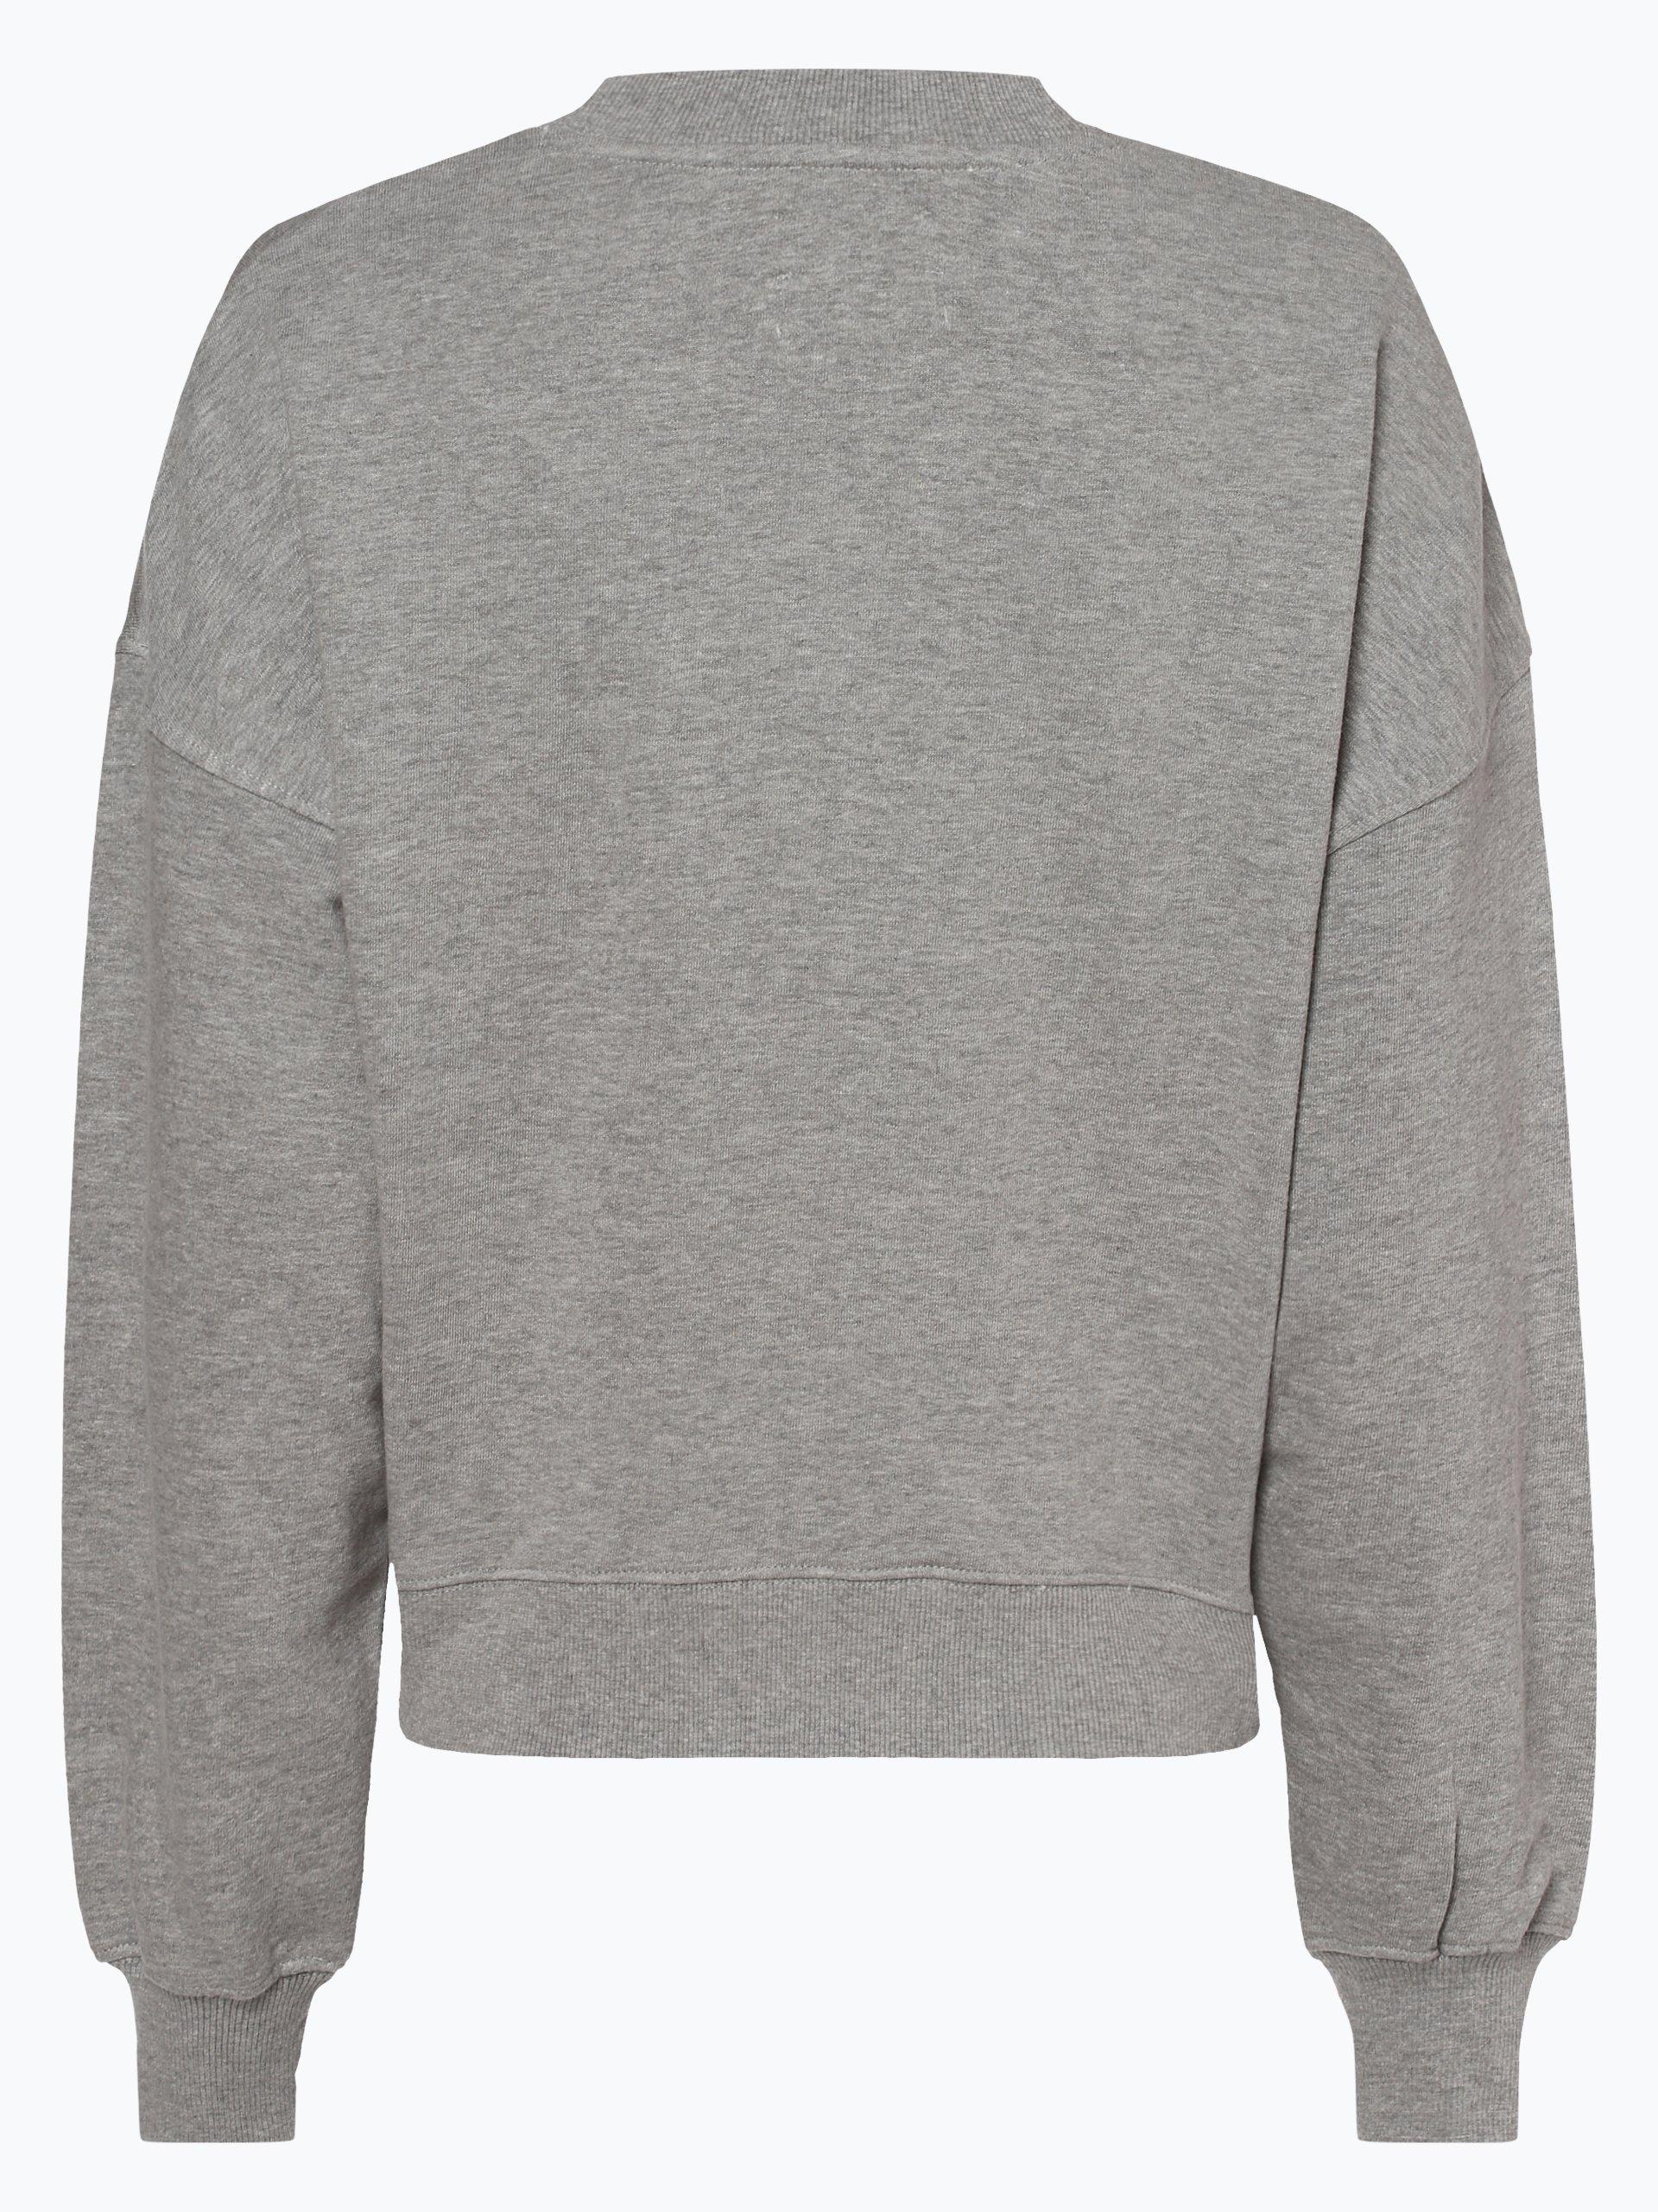 Essentiel Antwerp Damska bluza nierozpinana